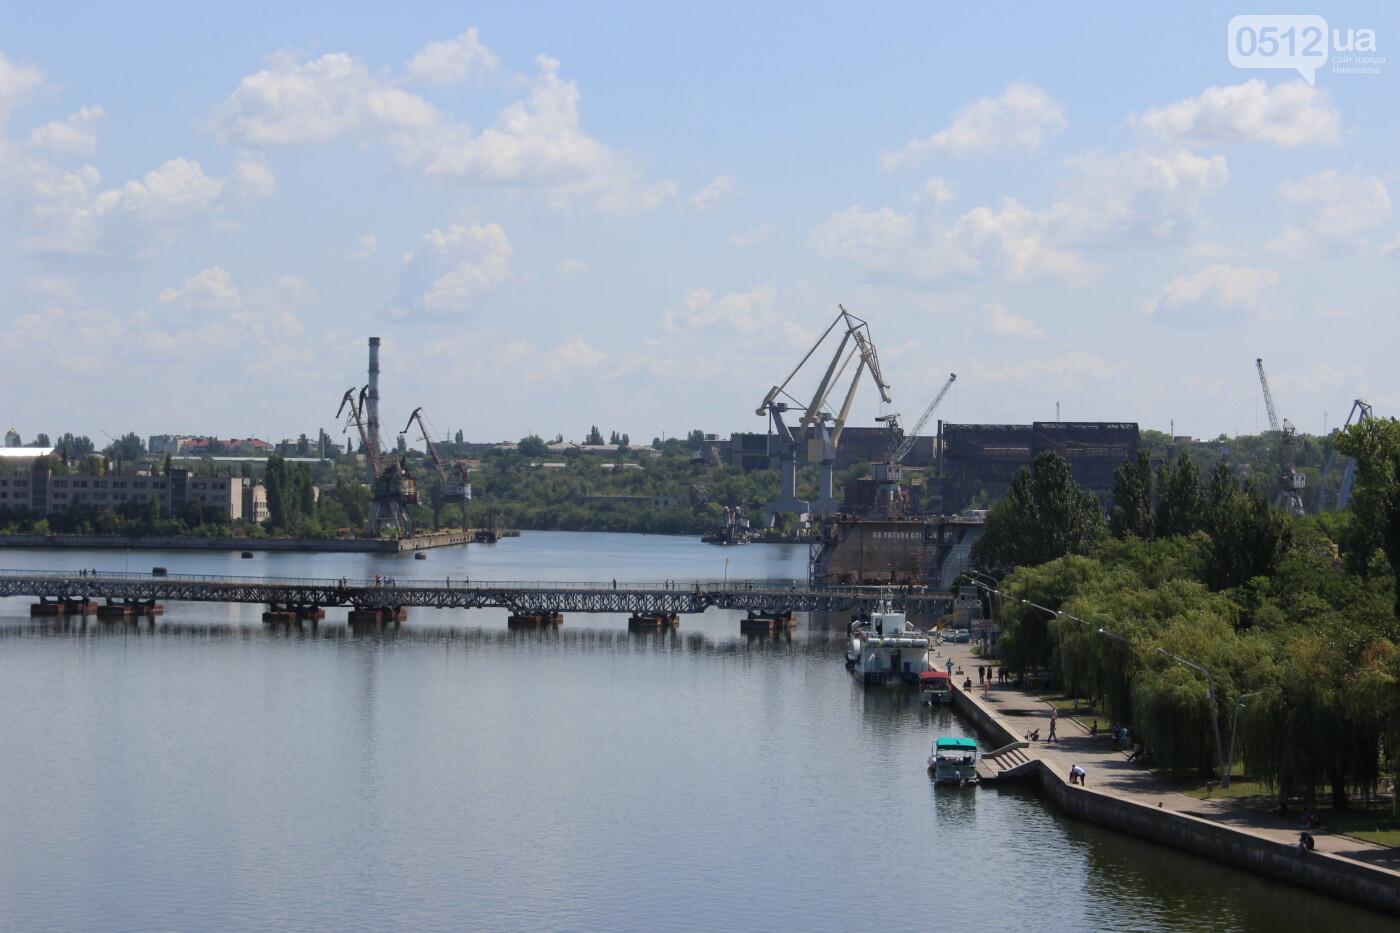 В Николаеве разводку мостов перенесли на завтра, - ФОТО, фото-2